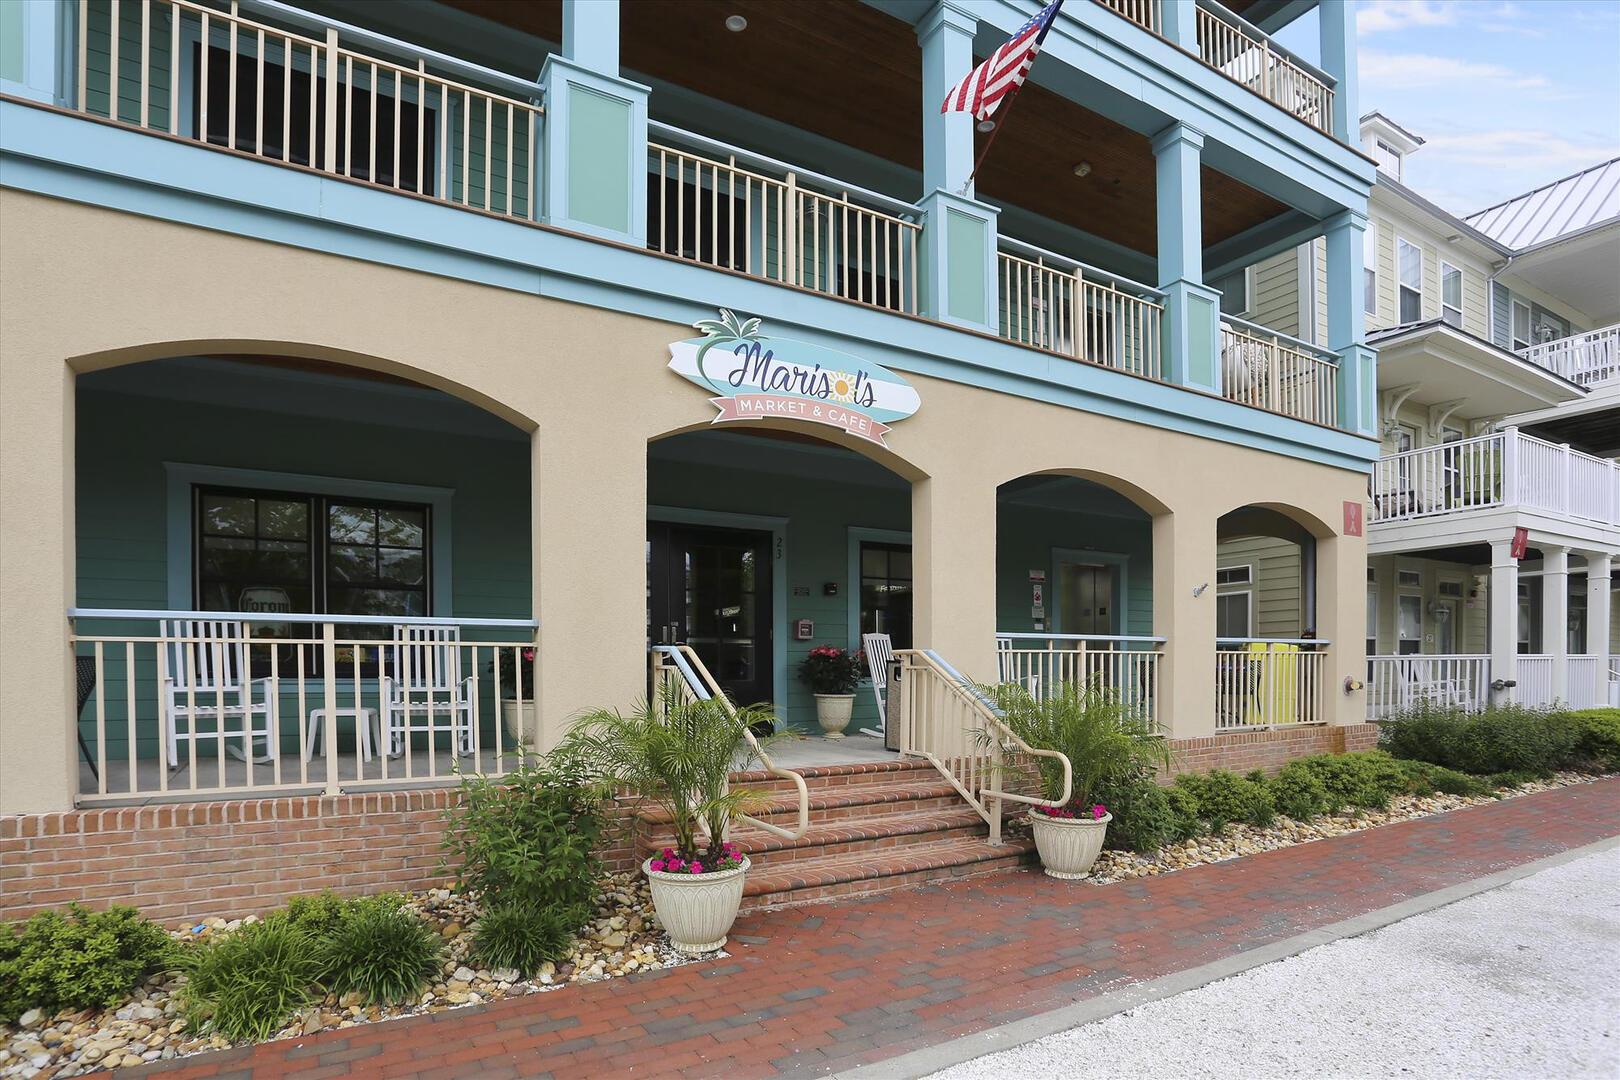 Sunset Island General Store (open seasonally)